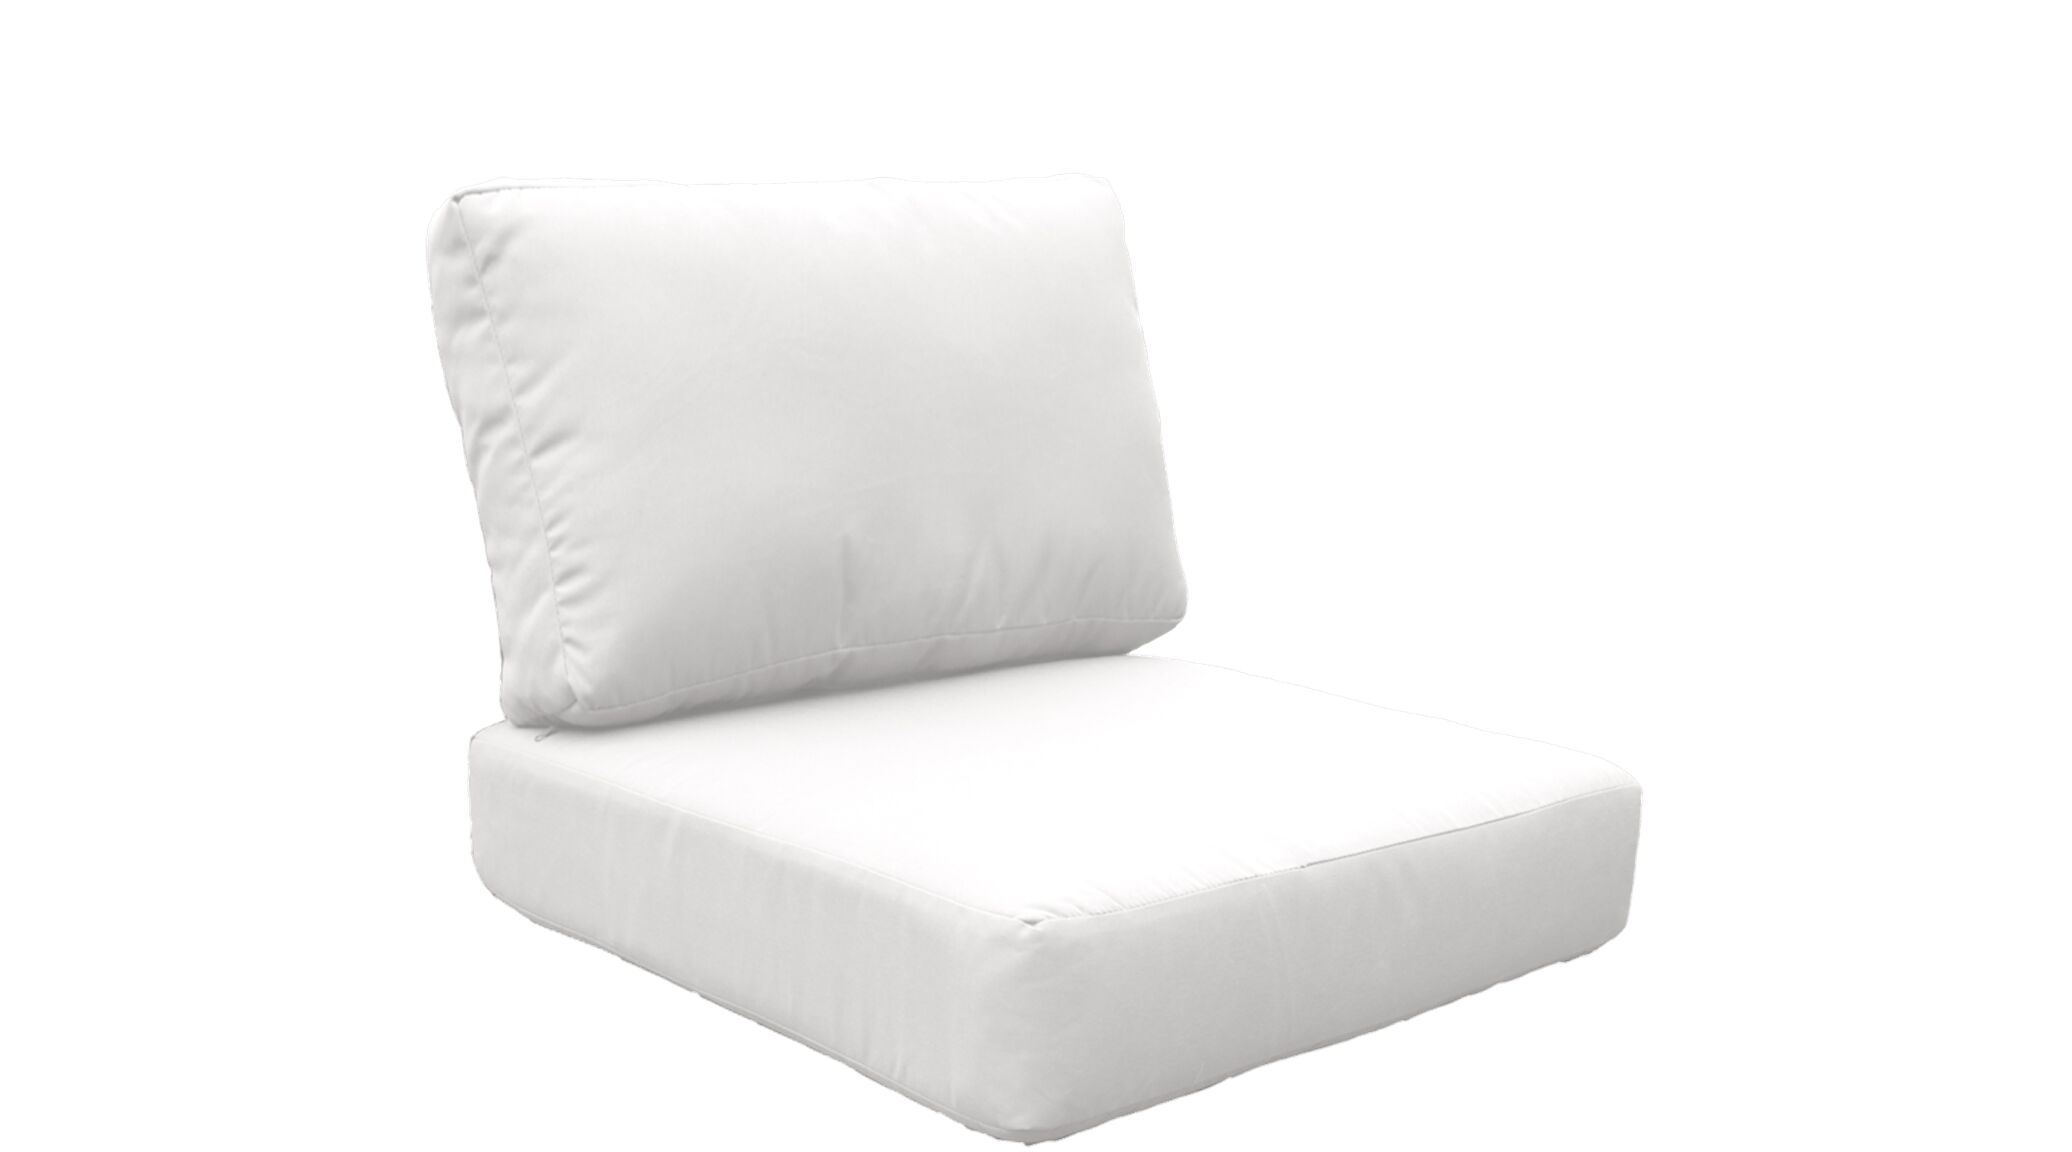 Miami 10 Piece Outdoor Lounge Chair Cushion Set Fabric: White